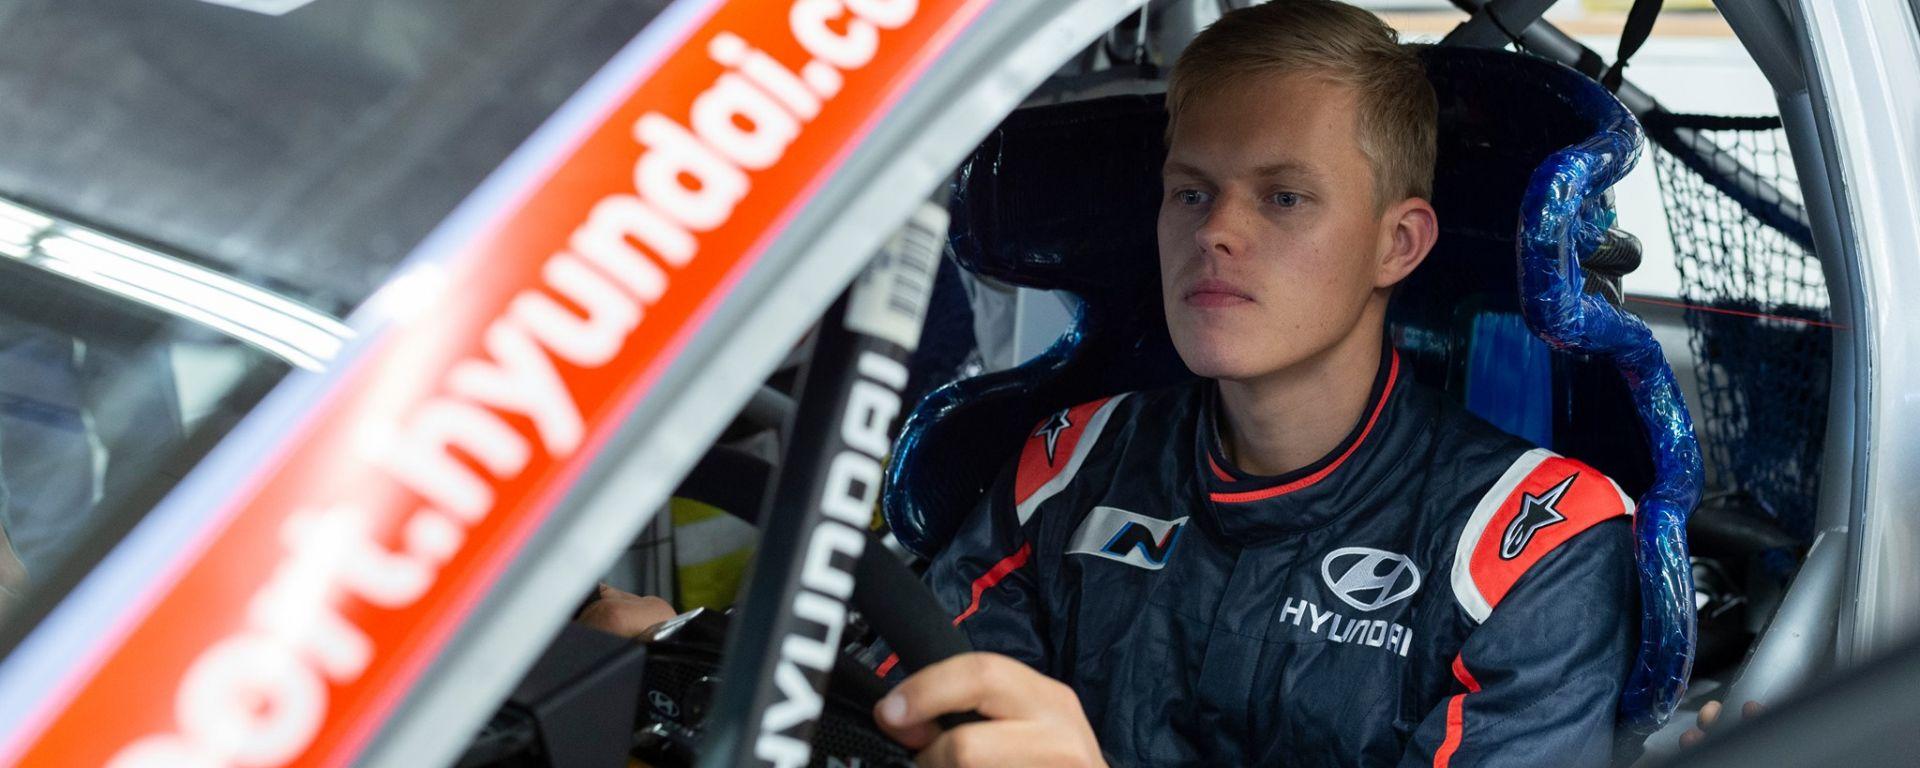 WRC 2020: Ott Tanak (Hyundai)